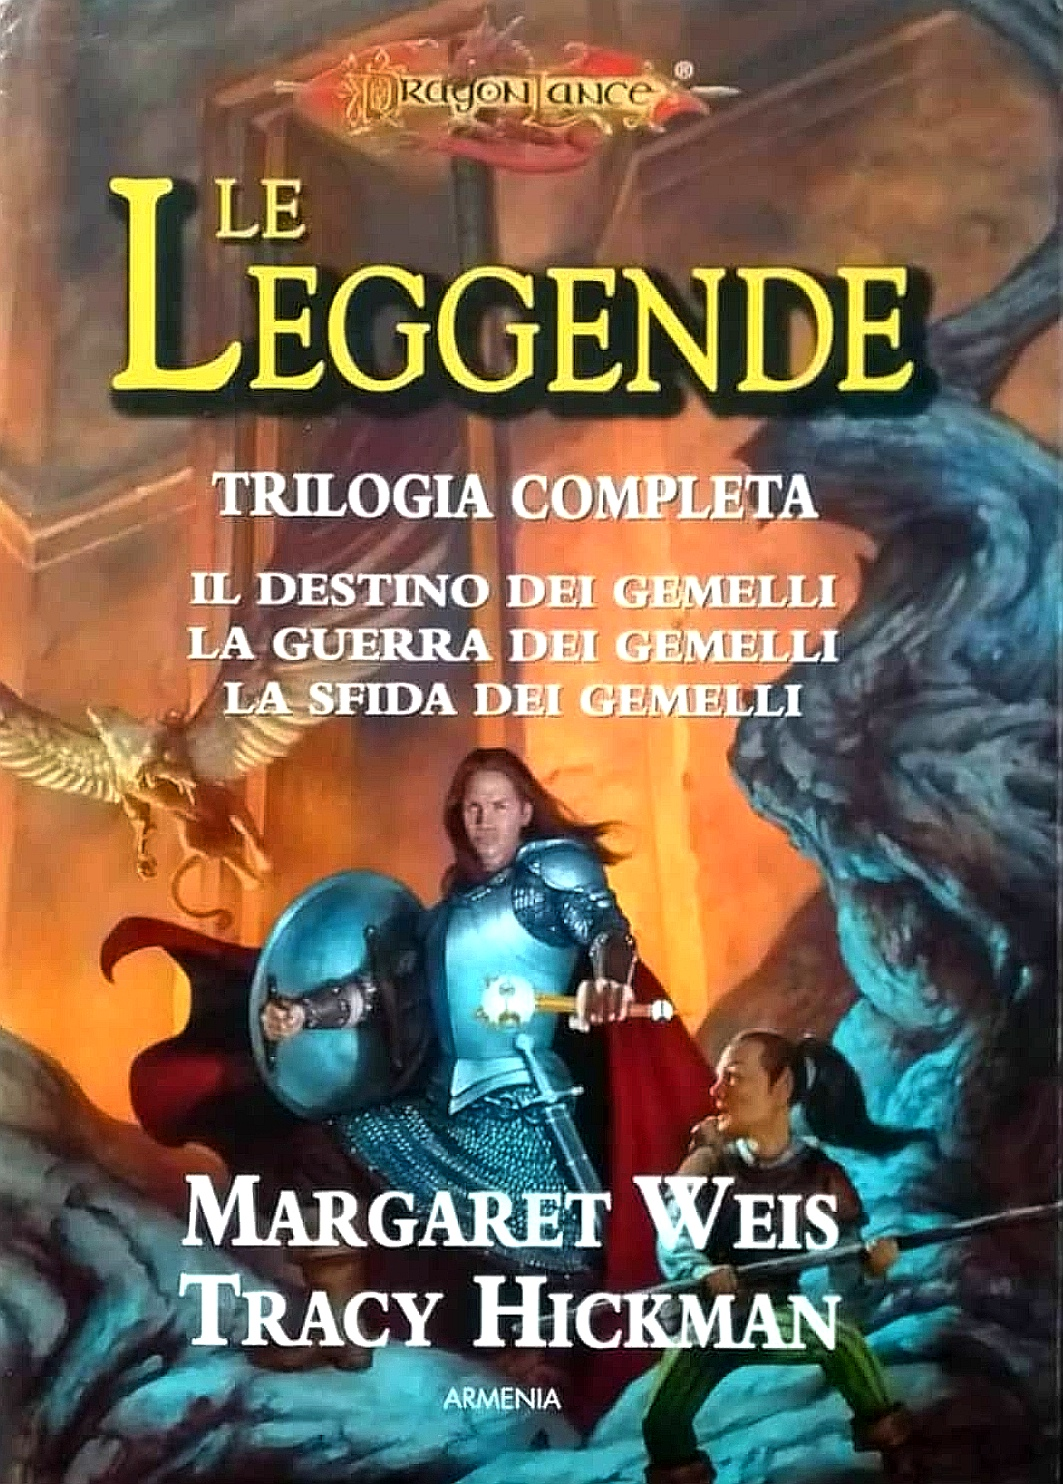 Dragonlance: Le Leggende